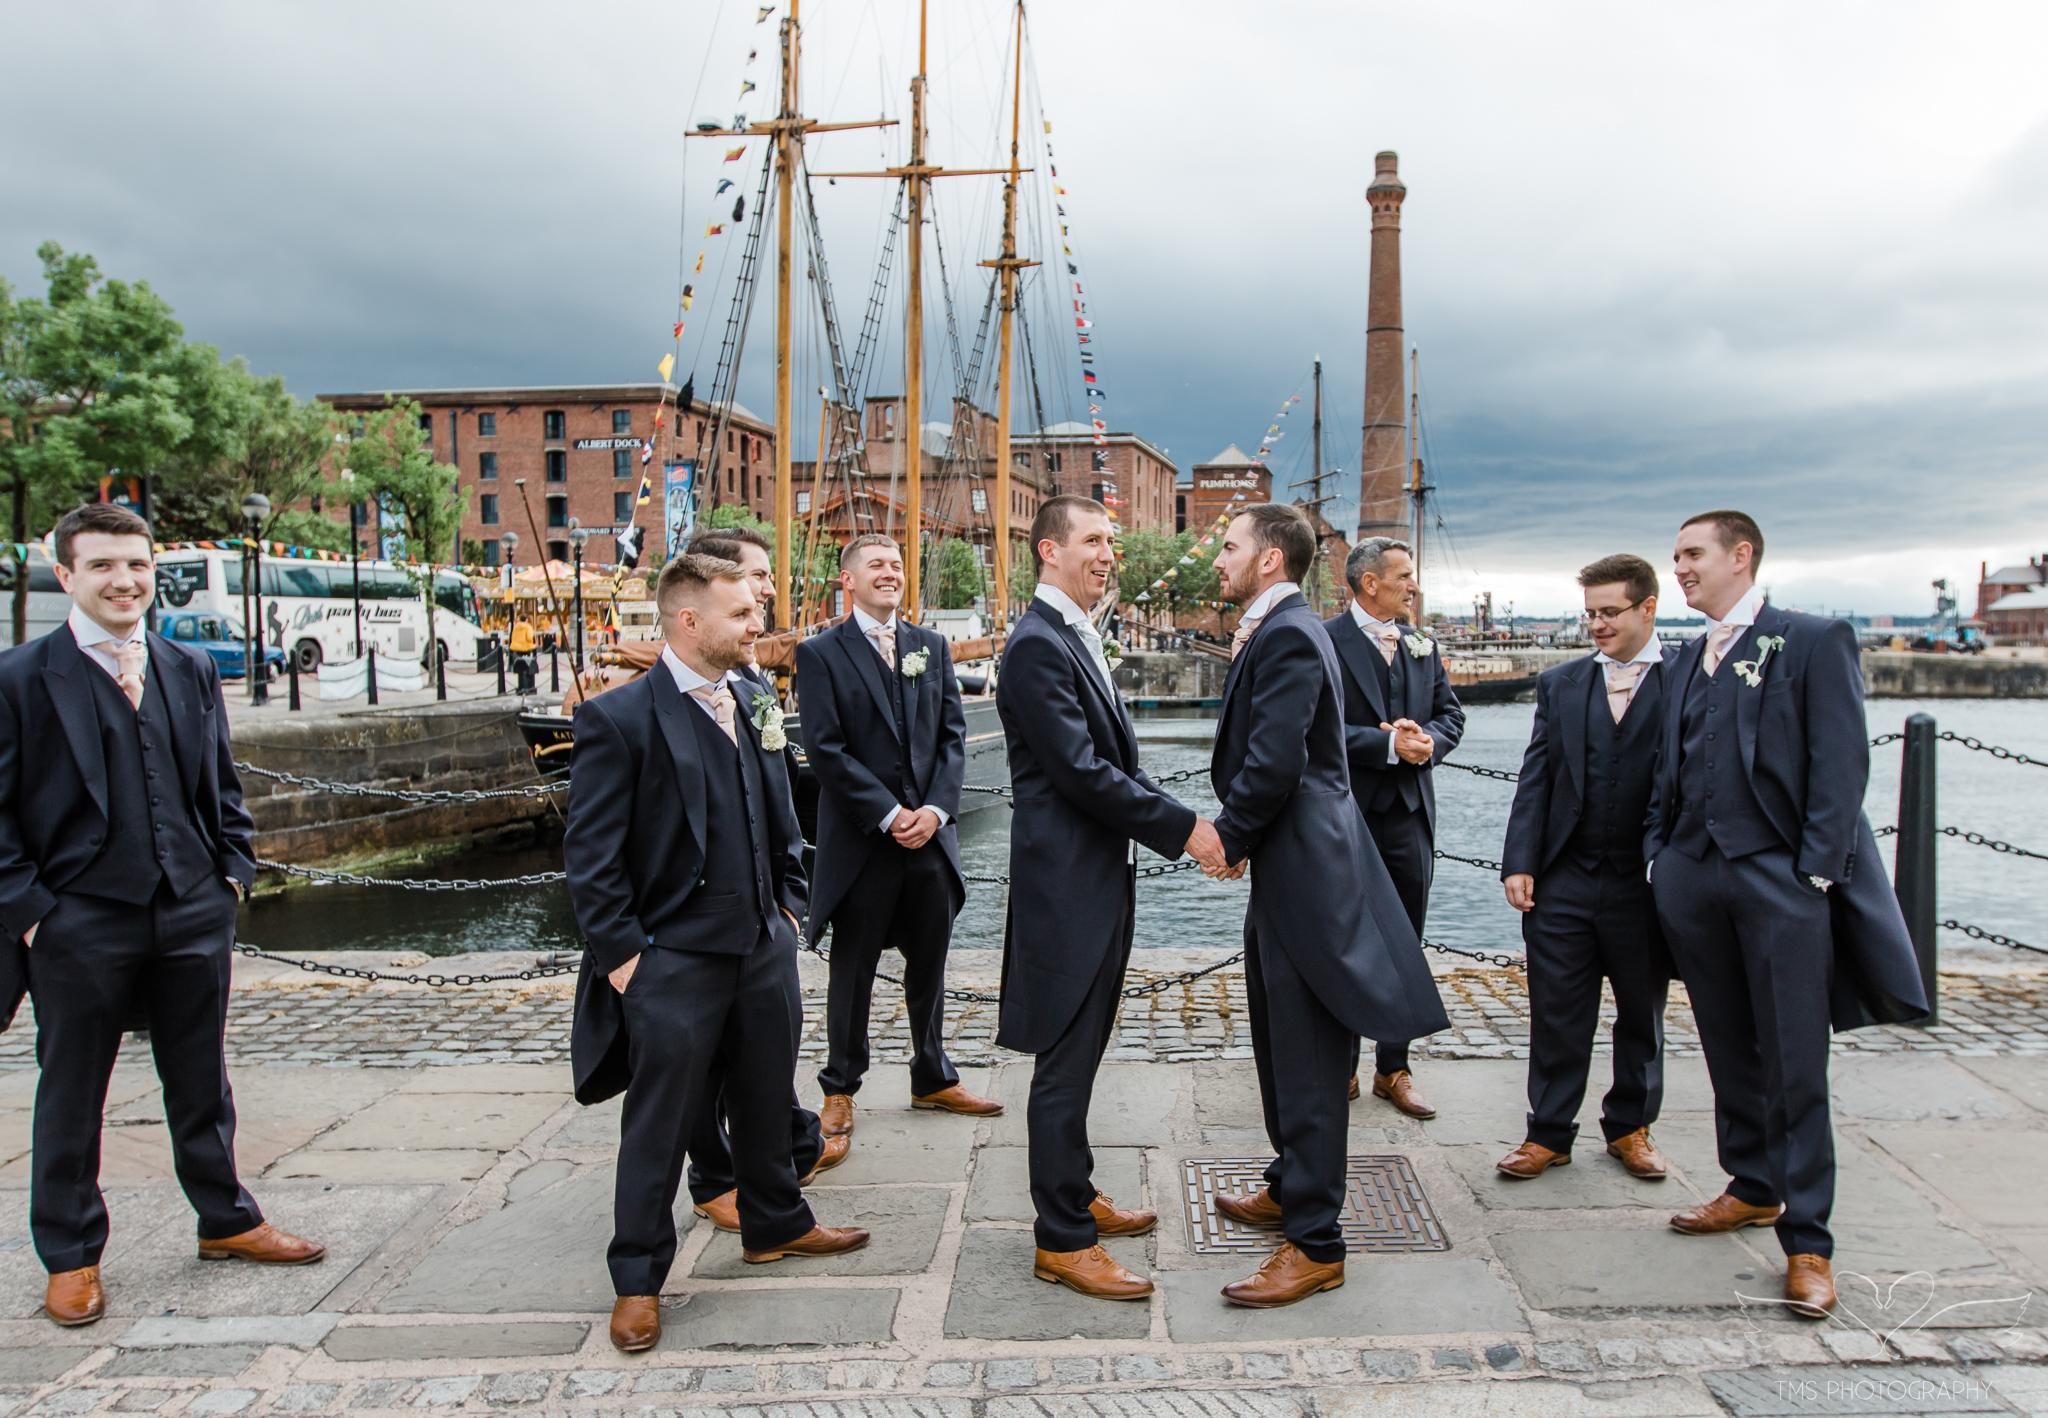 Wedding_photography_Hilton_liverpool_Albertdocks-167